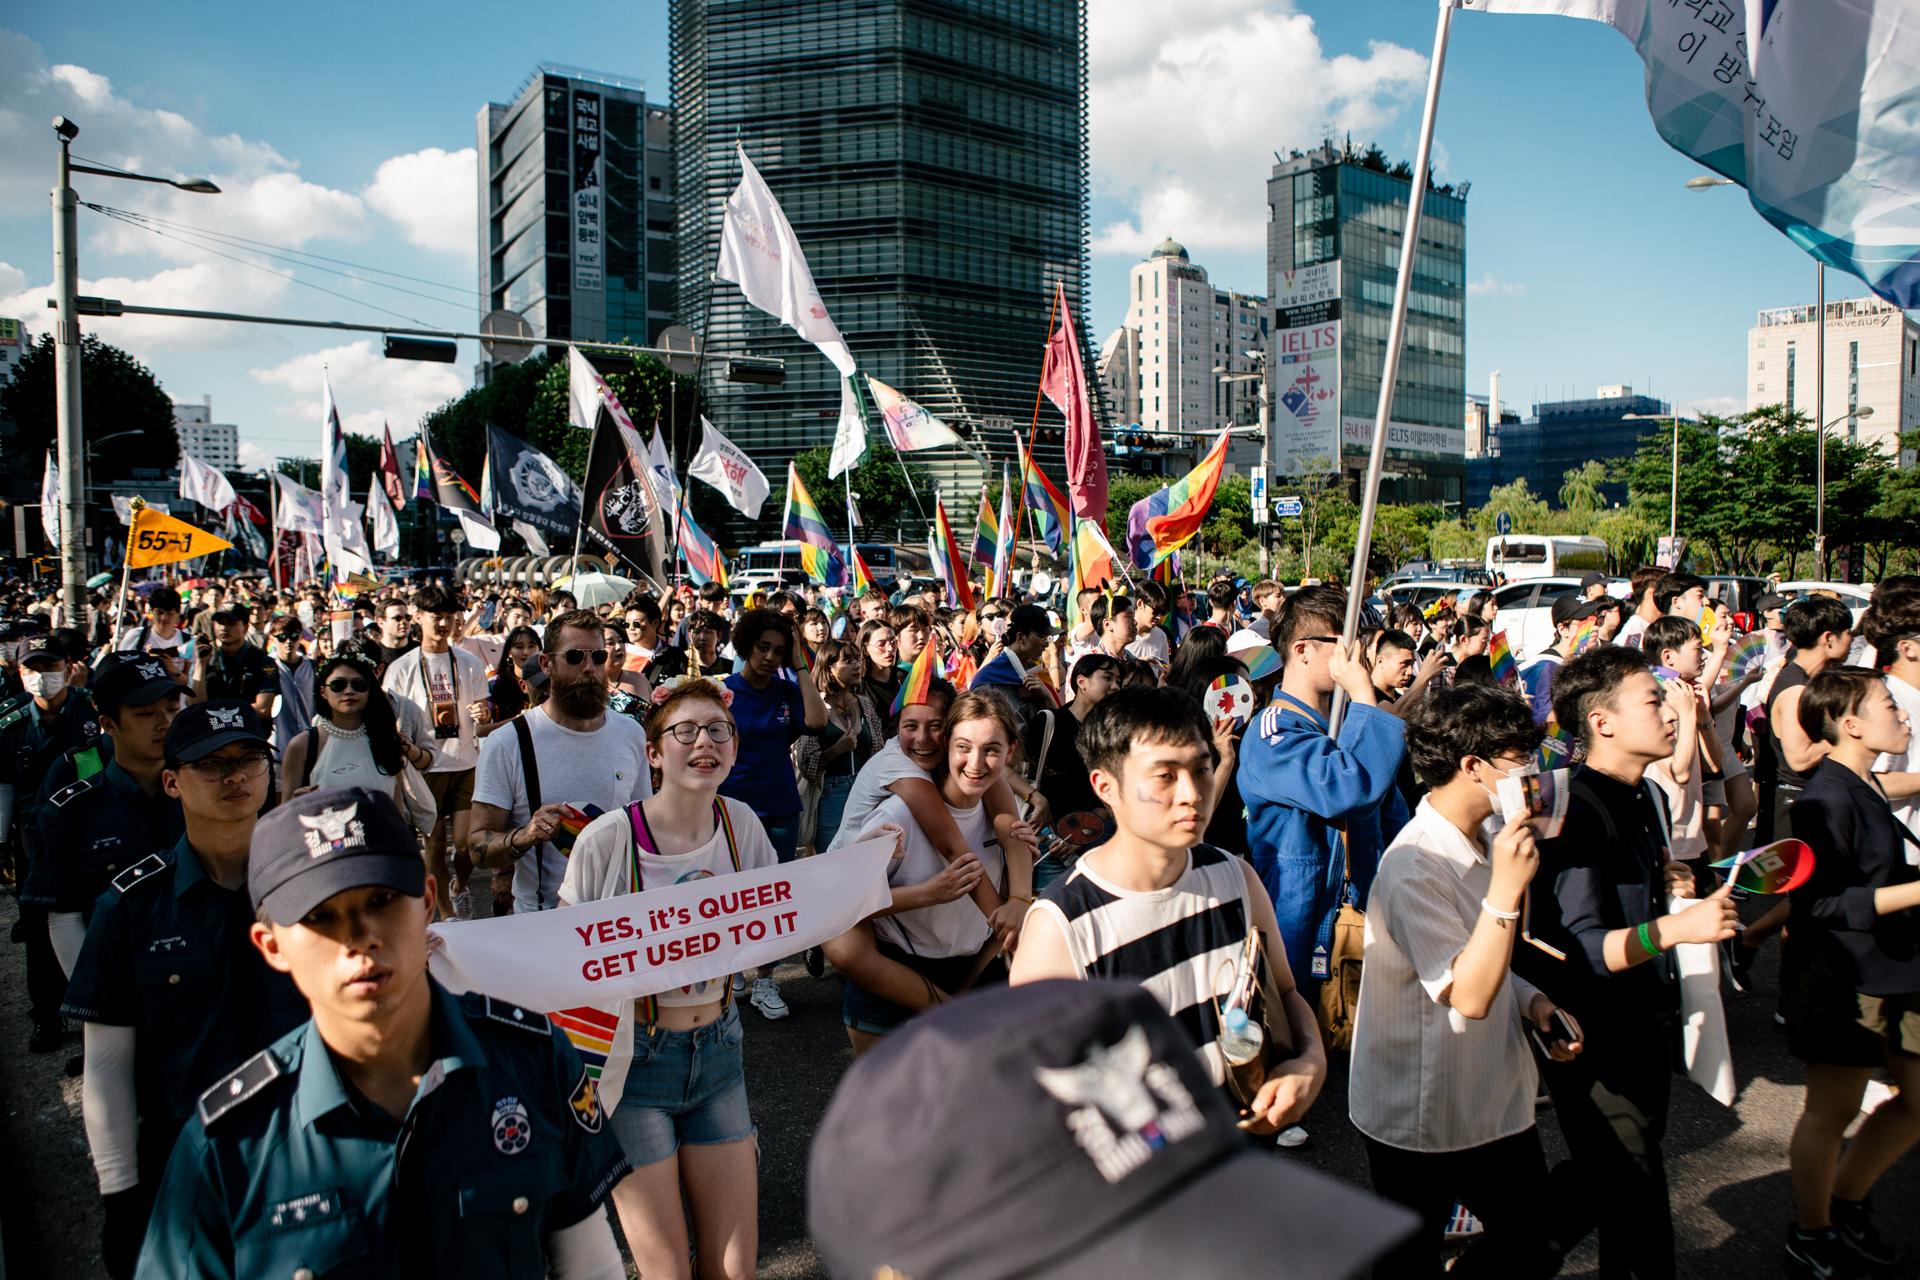 Seoul Queer Pride 2018, South Korea (2018)